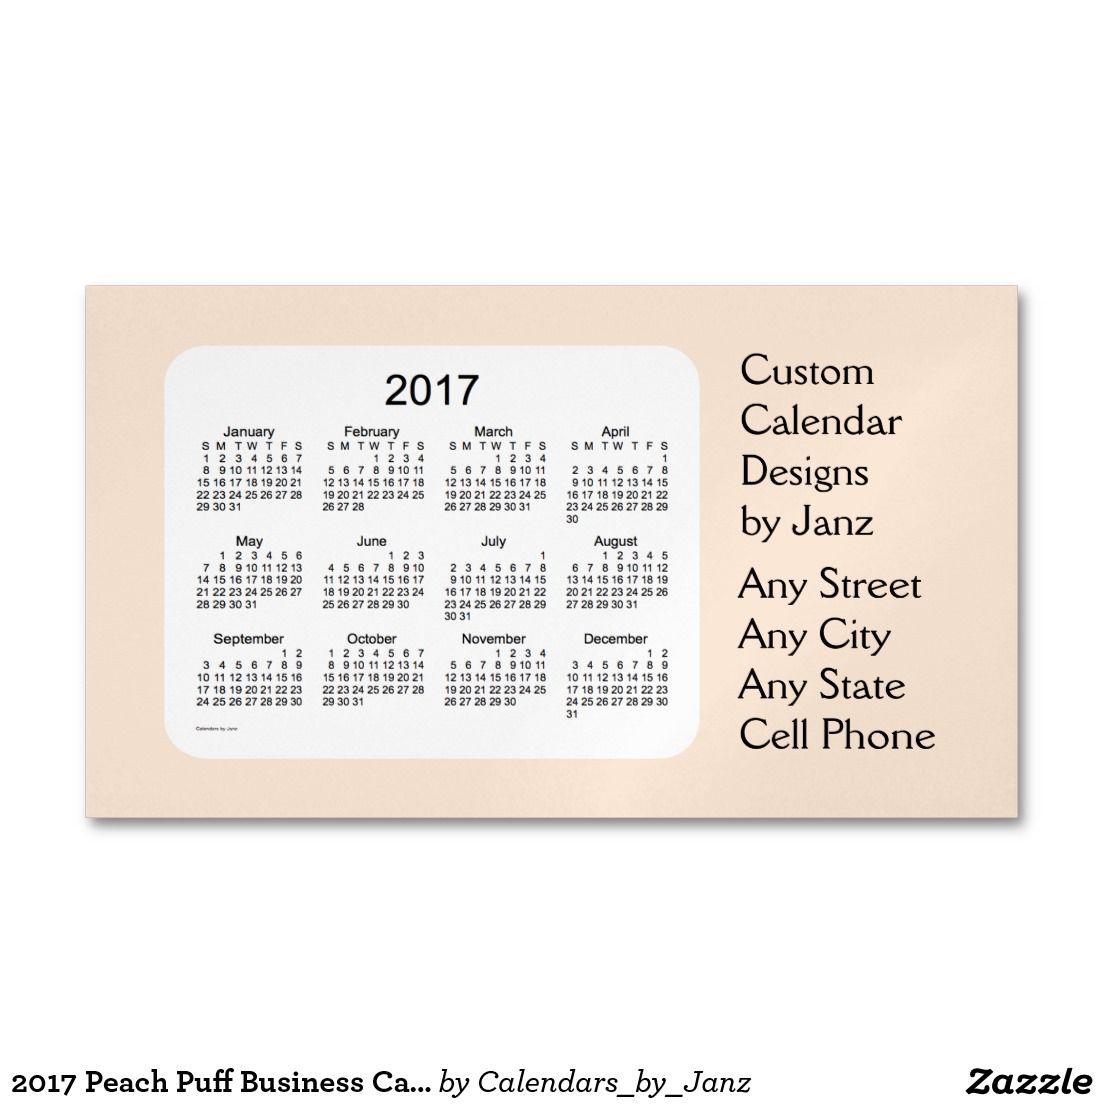 2017 peach puff business calendar by janz magnet magnetic business 2017 salmon business calendar by janz magnet magnetic business cards pack of colourmoves Images